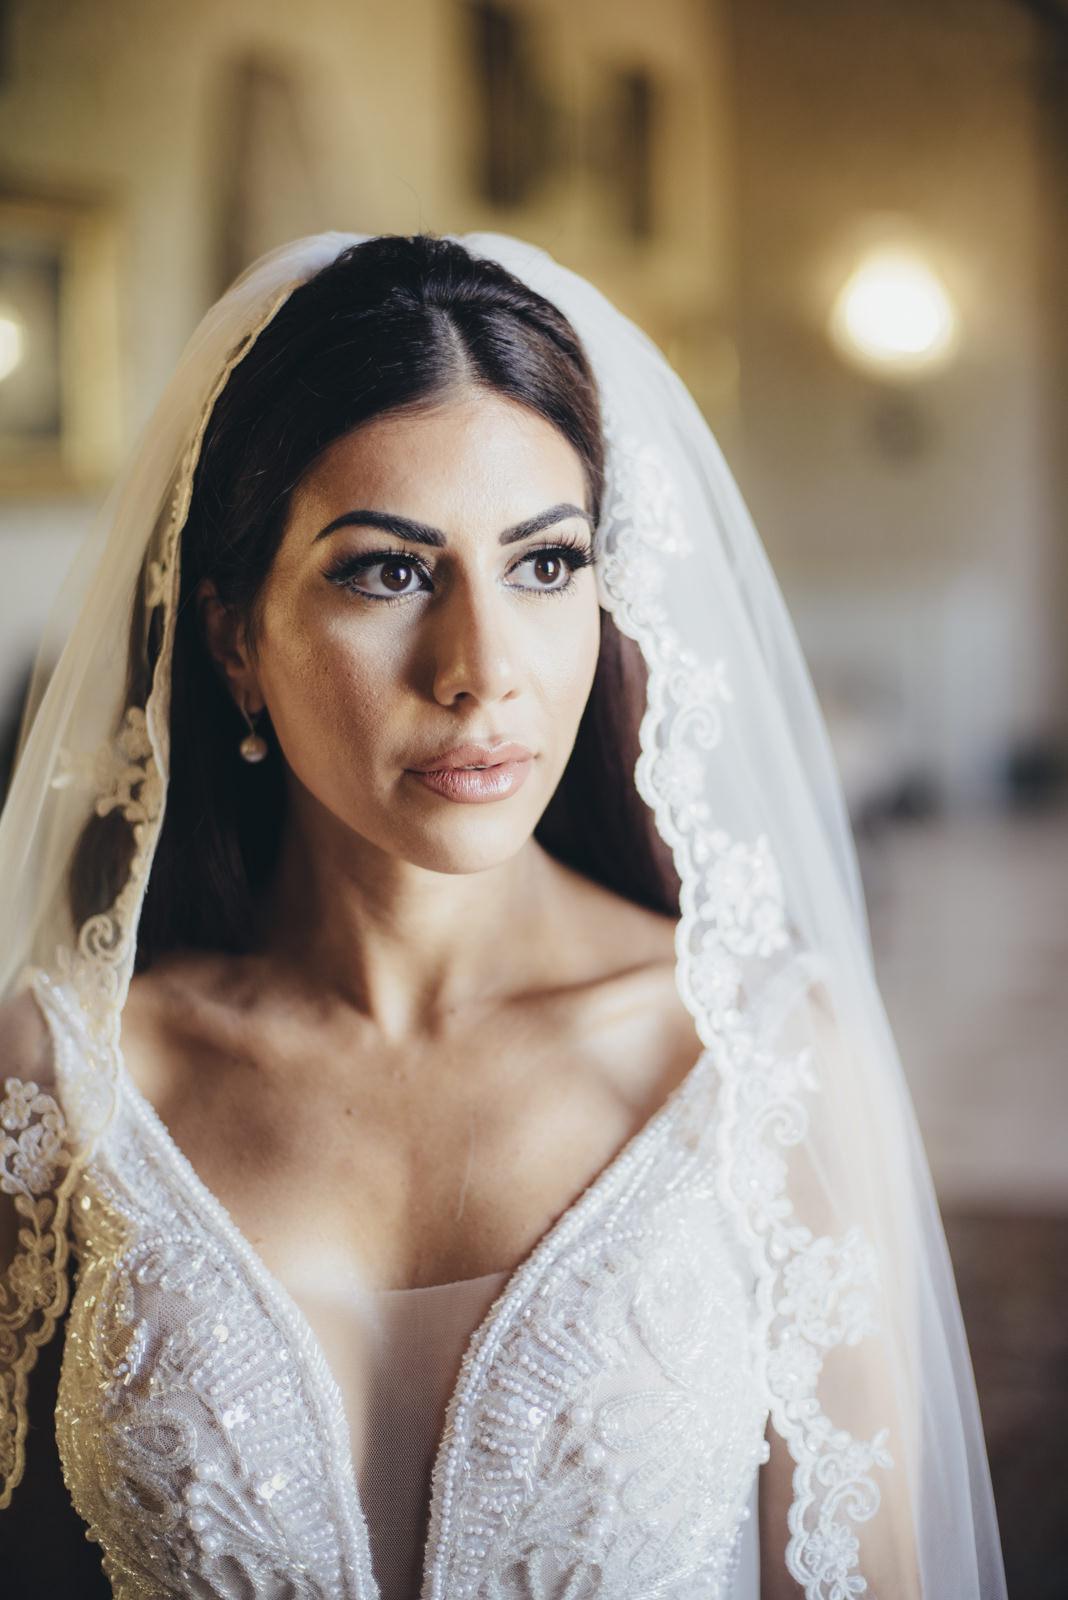 bride's portrait with the wedding veil